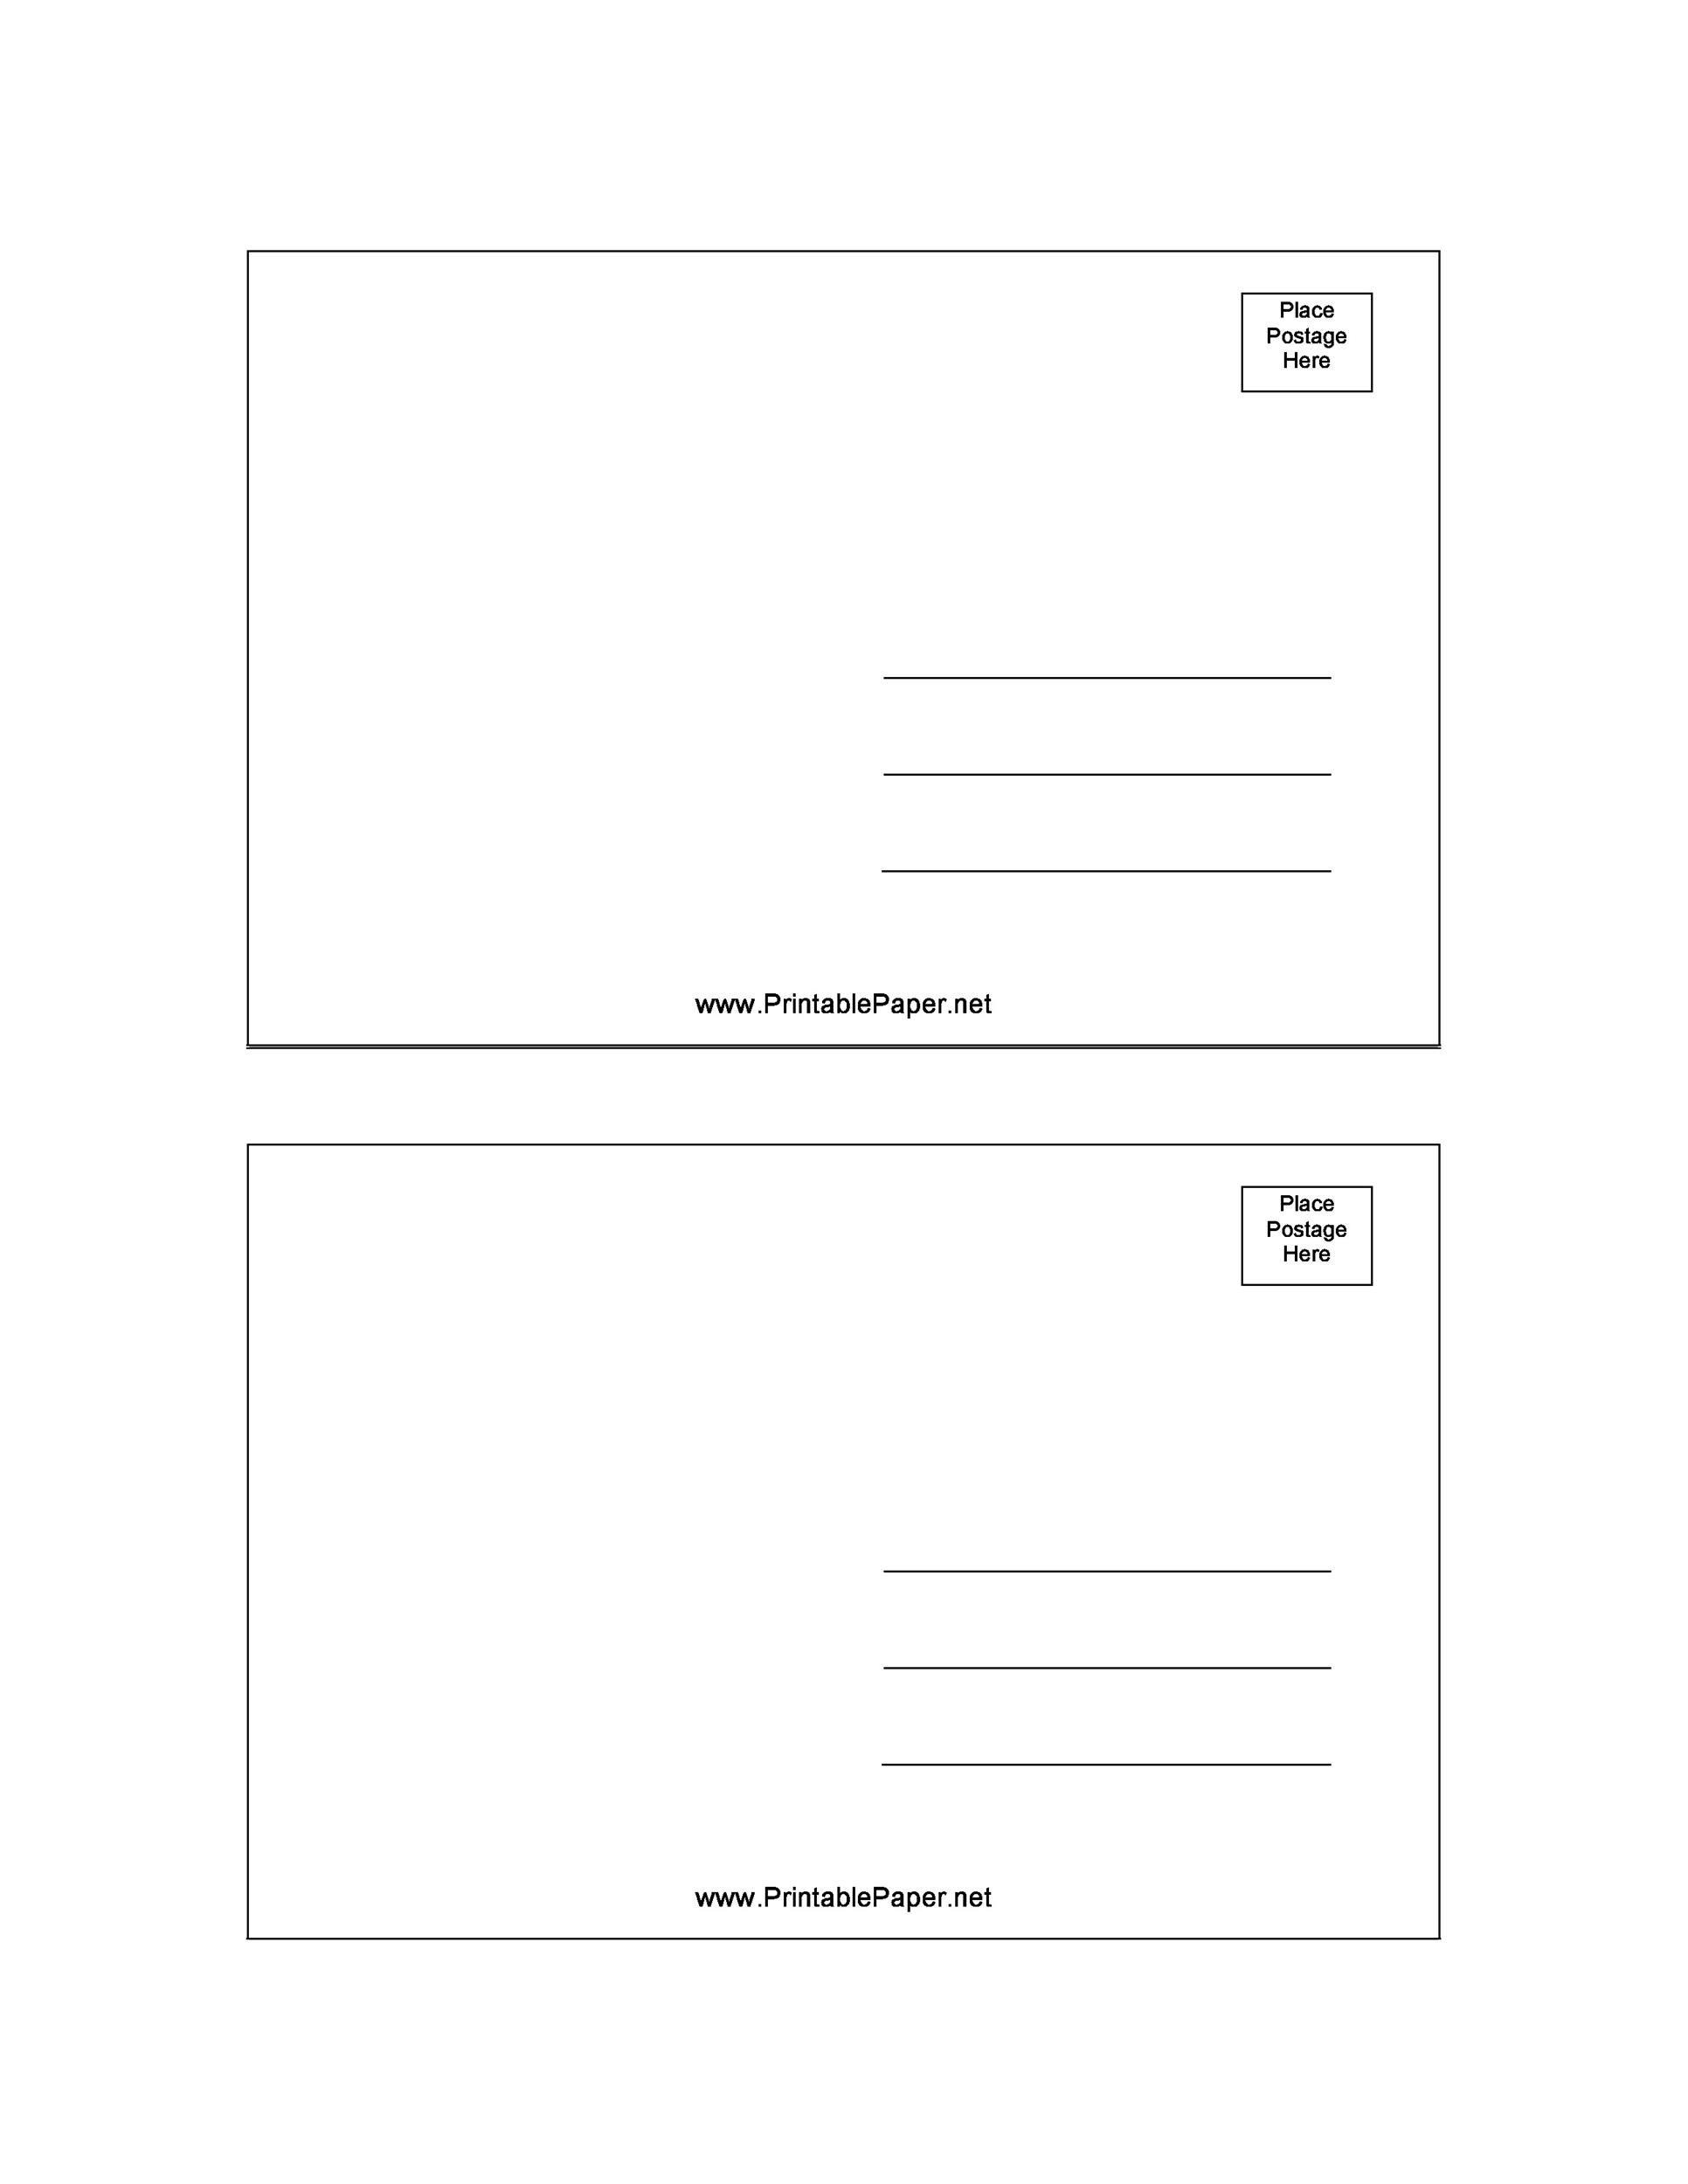 40 Great Postcard Templates Amp Designs Word